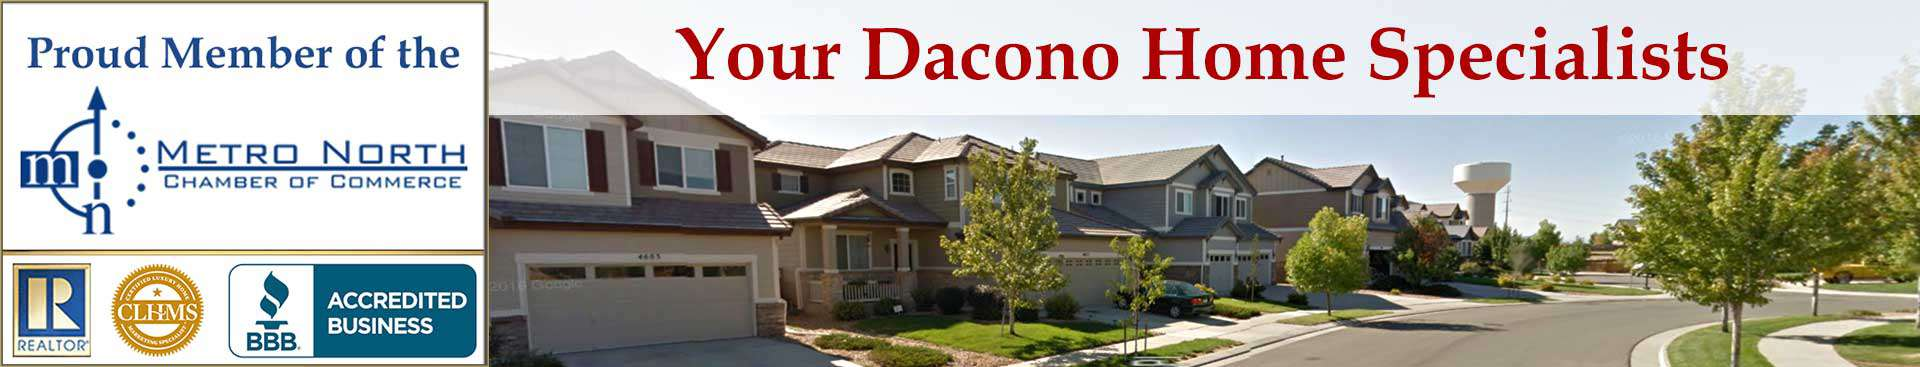 Dacono CO Organizational Banner